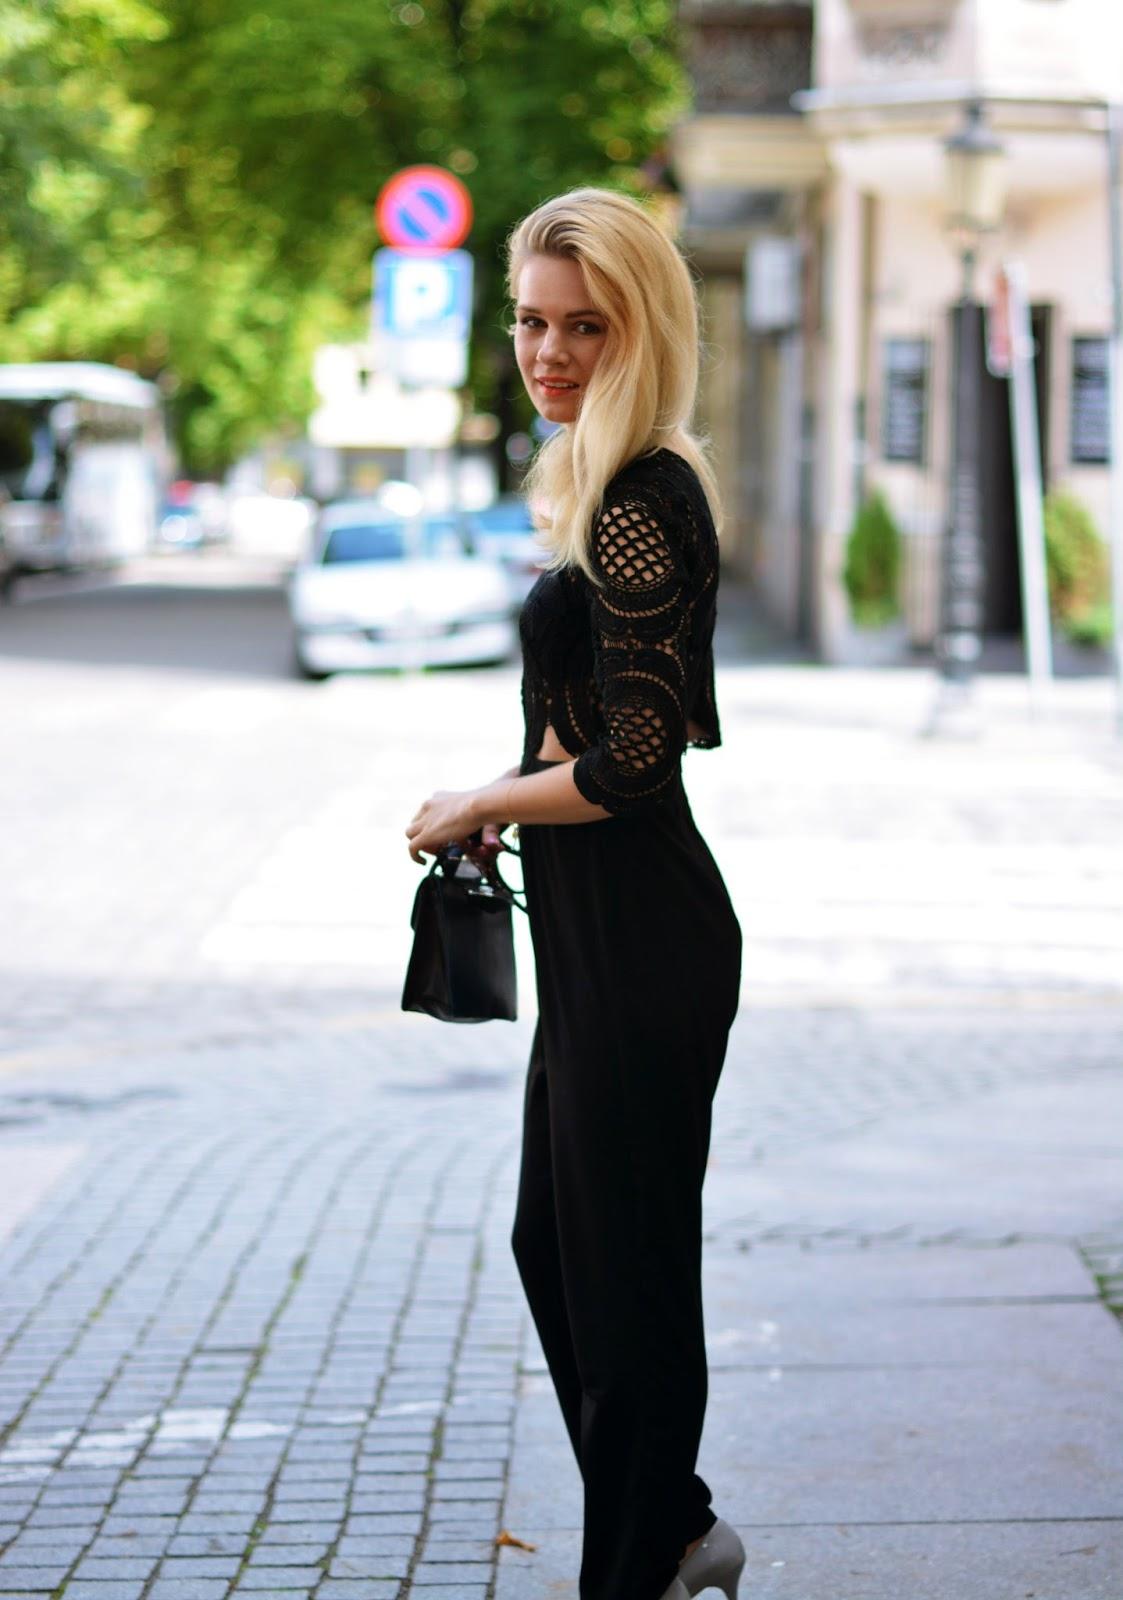 koronka, kombinezon, elegancki, koronkowy, stylowy, stylizacja, blog, blogger